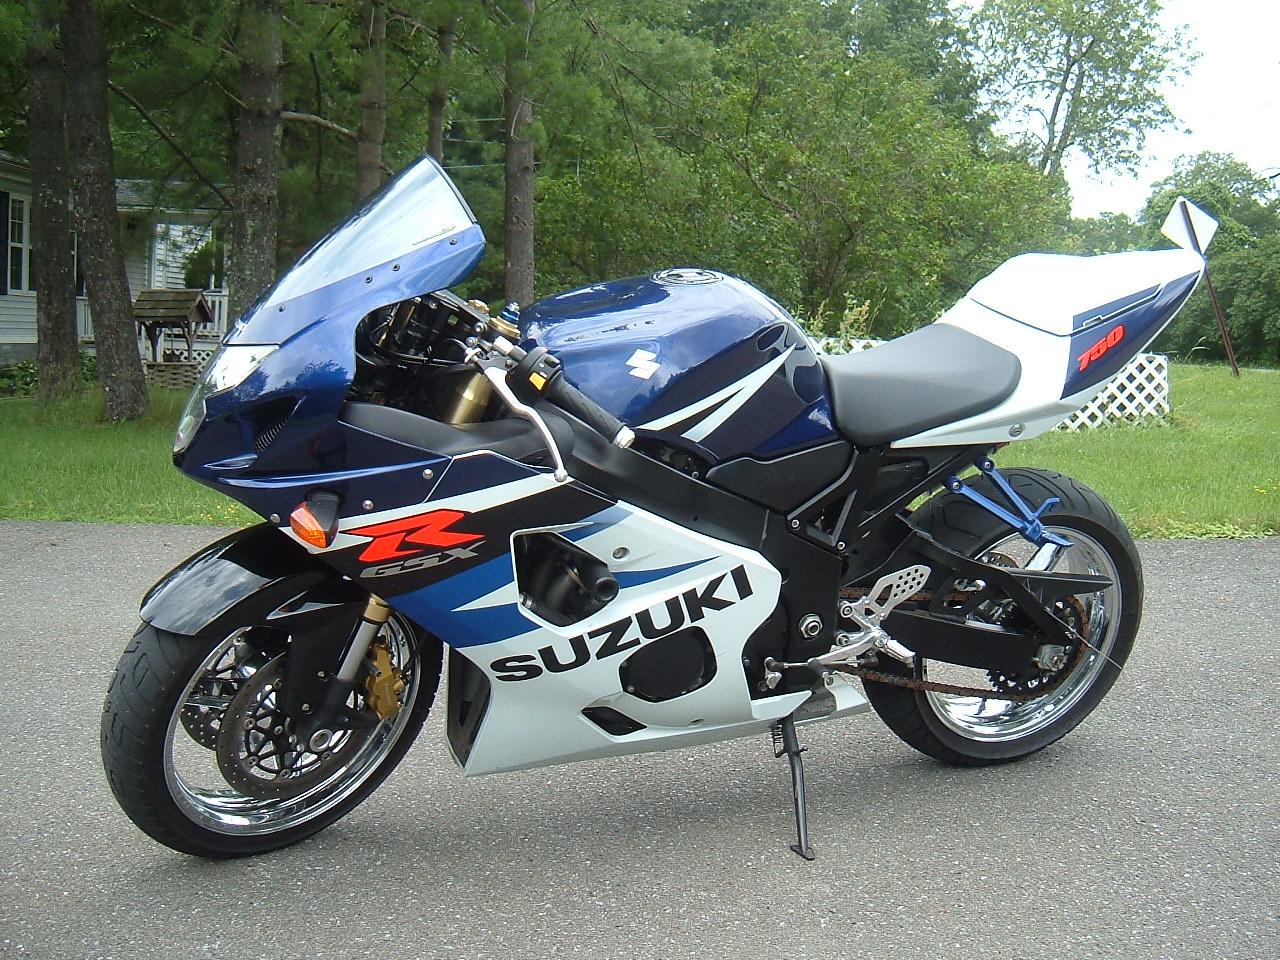 F/s 04 Gsxr 750 - Sportbikes.net